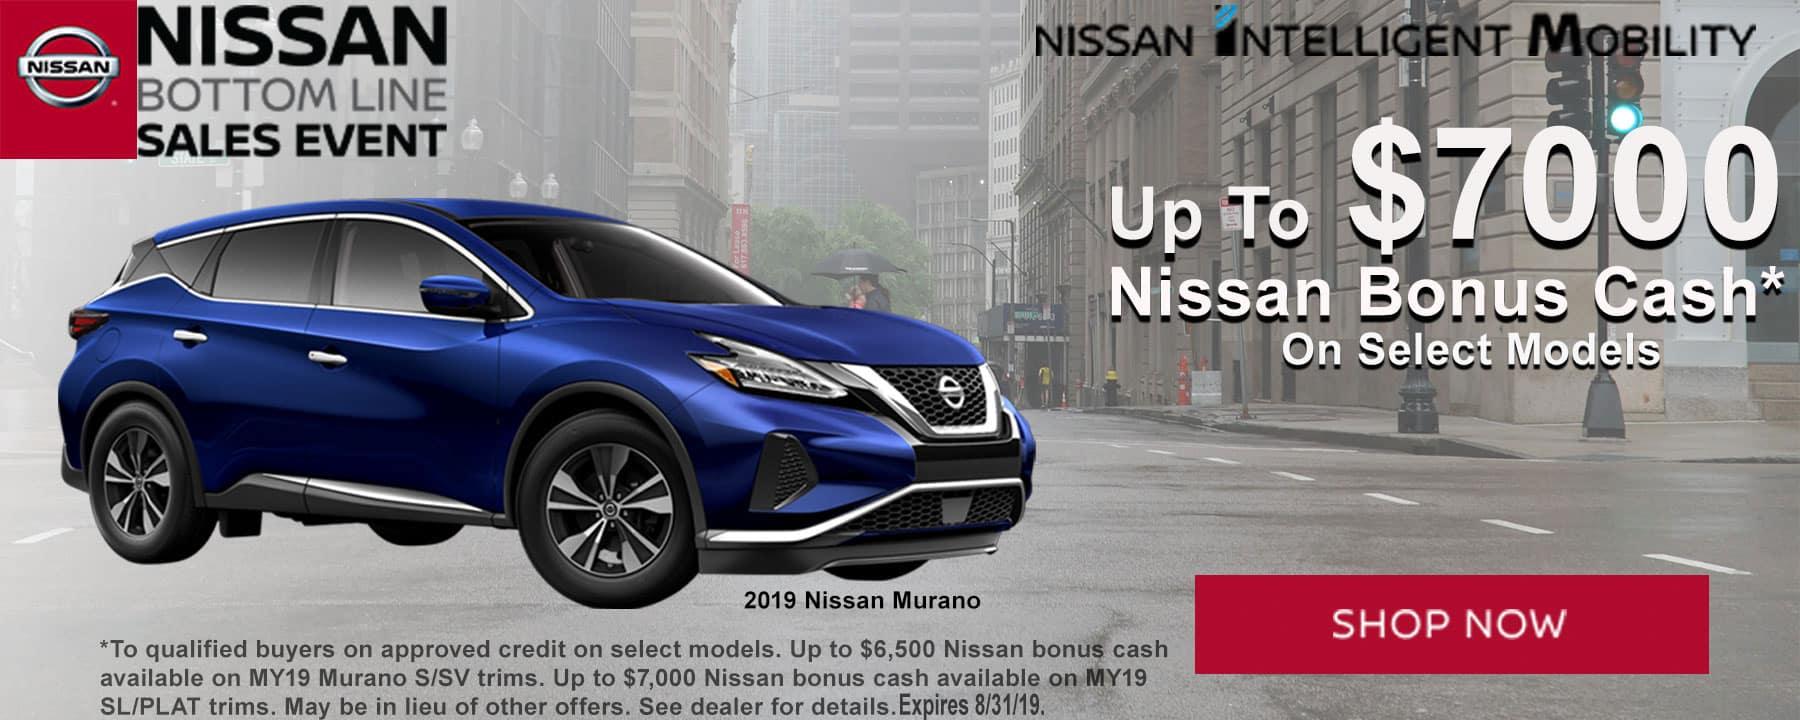 Get Up to $7,000 Nissan Bonus Cash on 2019 Nissan Murano at Star Nissan!